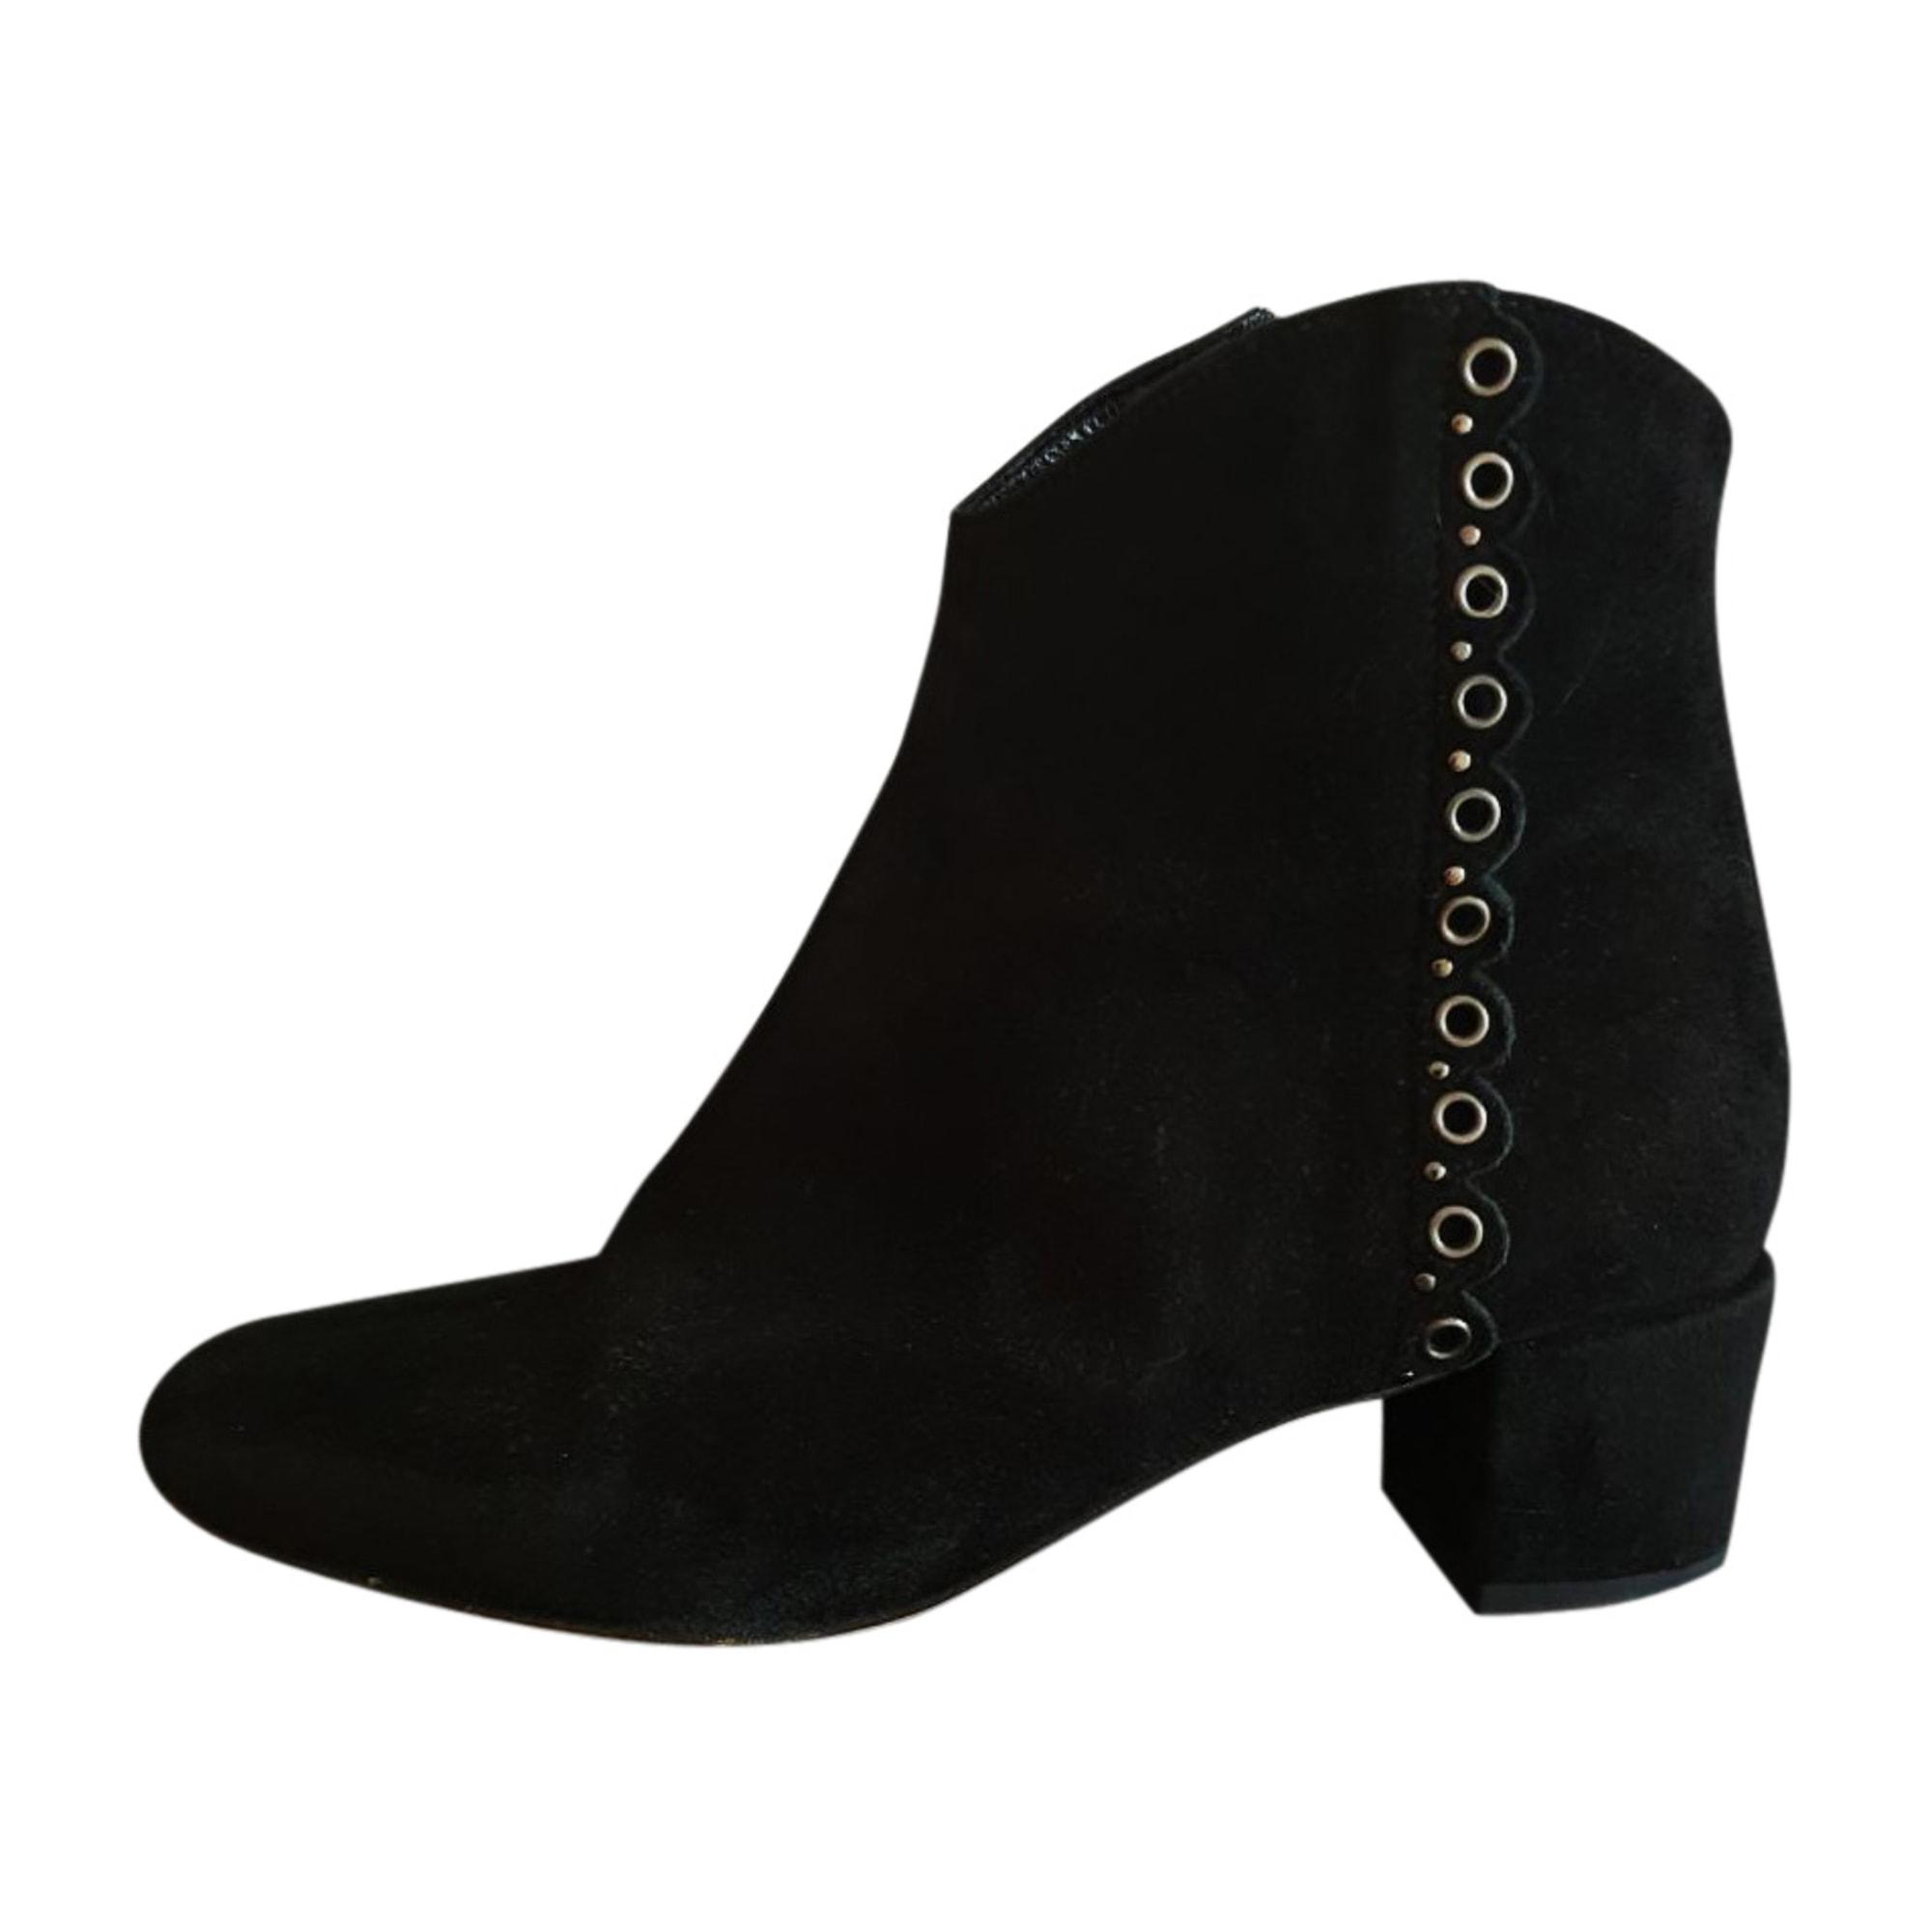 Bottines & low boots plates VANESSA BRUNO Noir